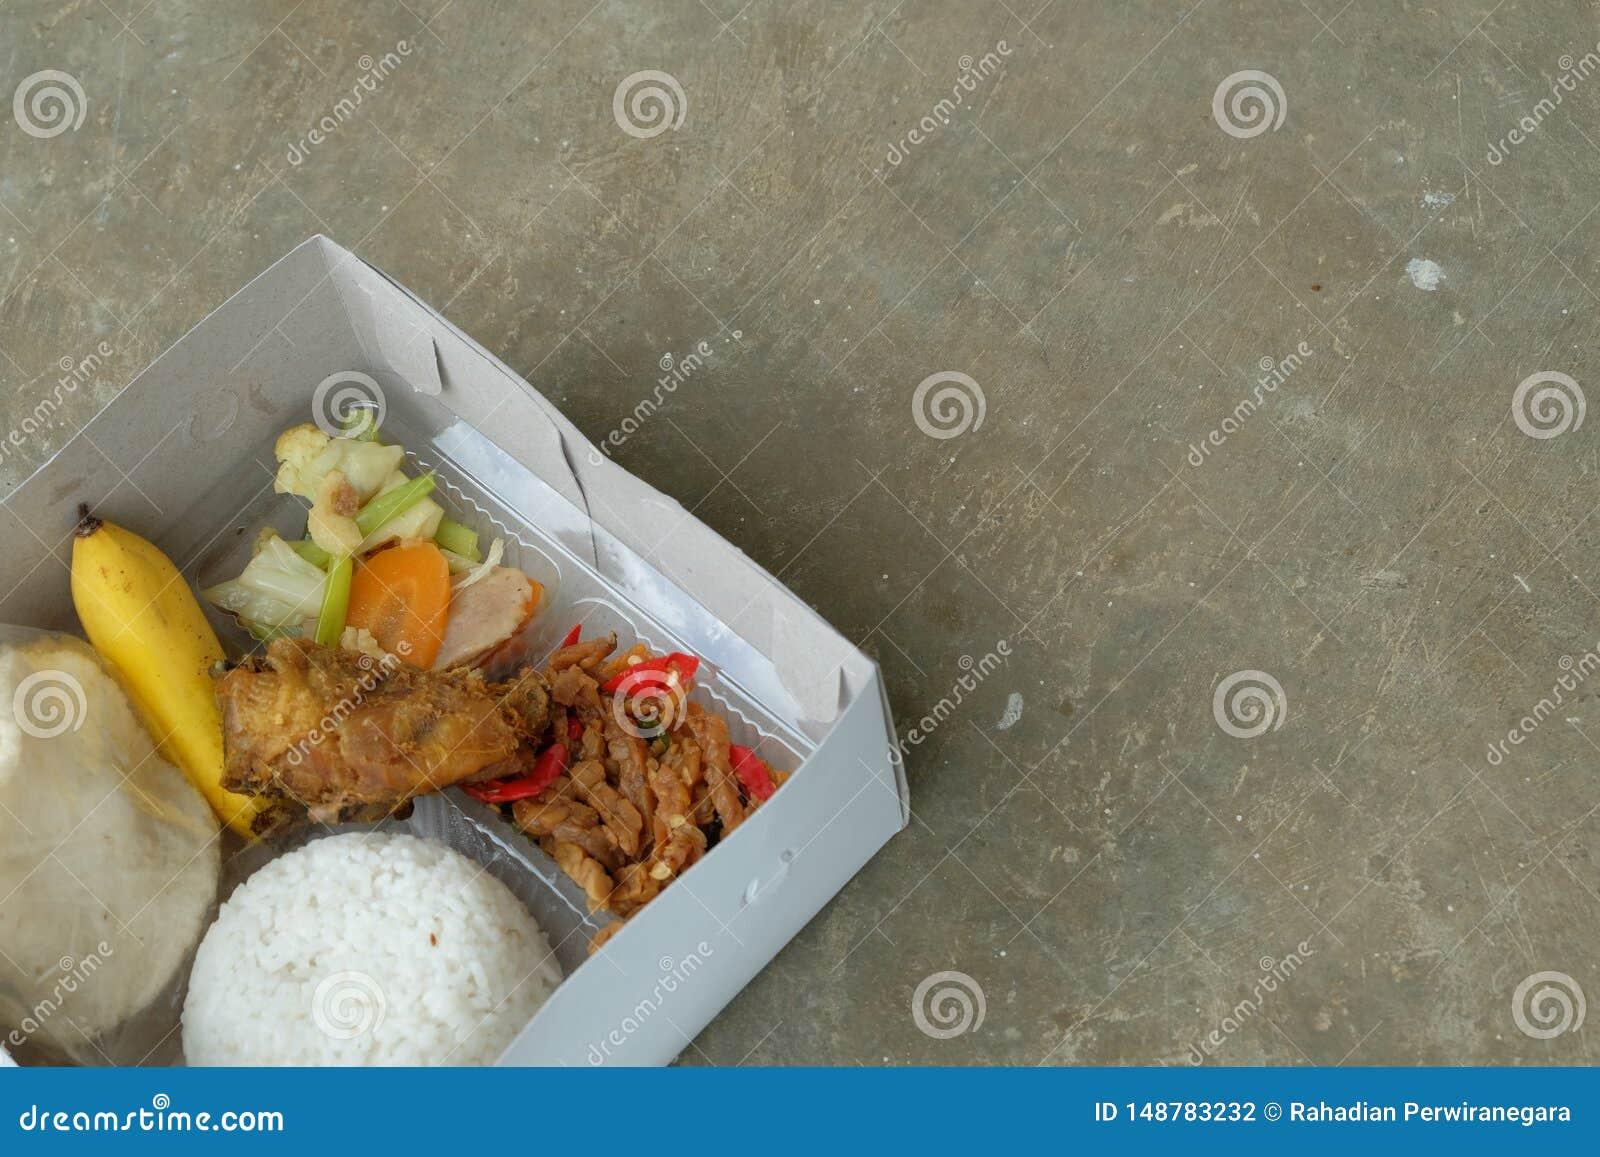 Nasi kotak或饭盒 与菜和鸡内圆角的混杂的米